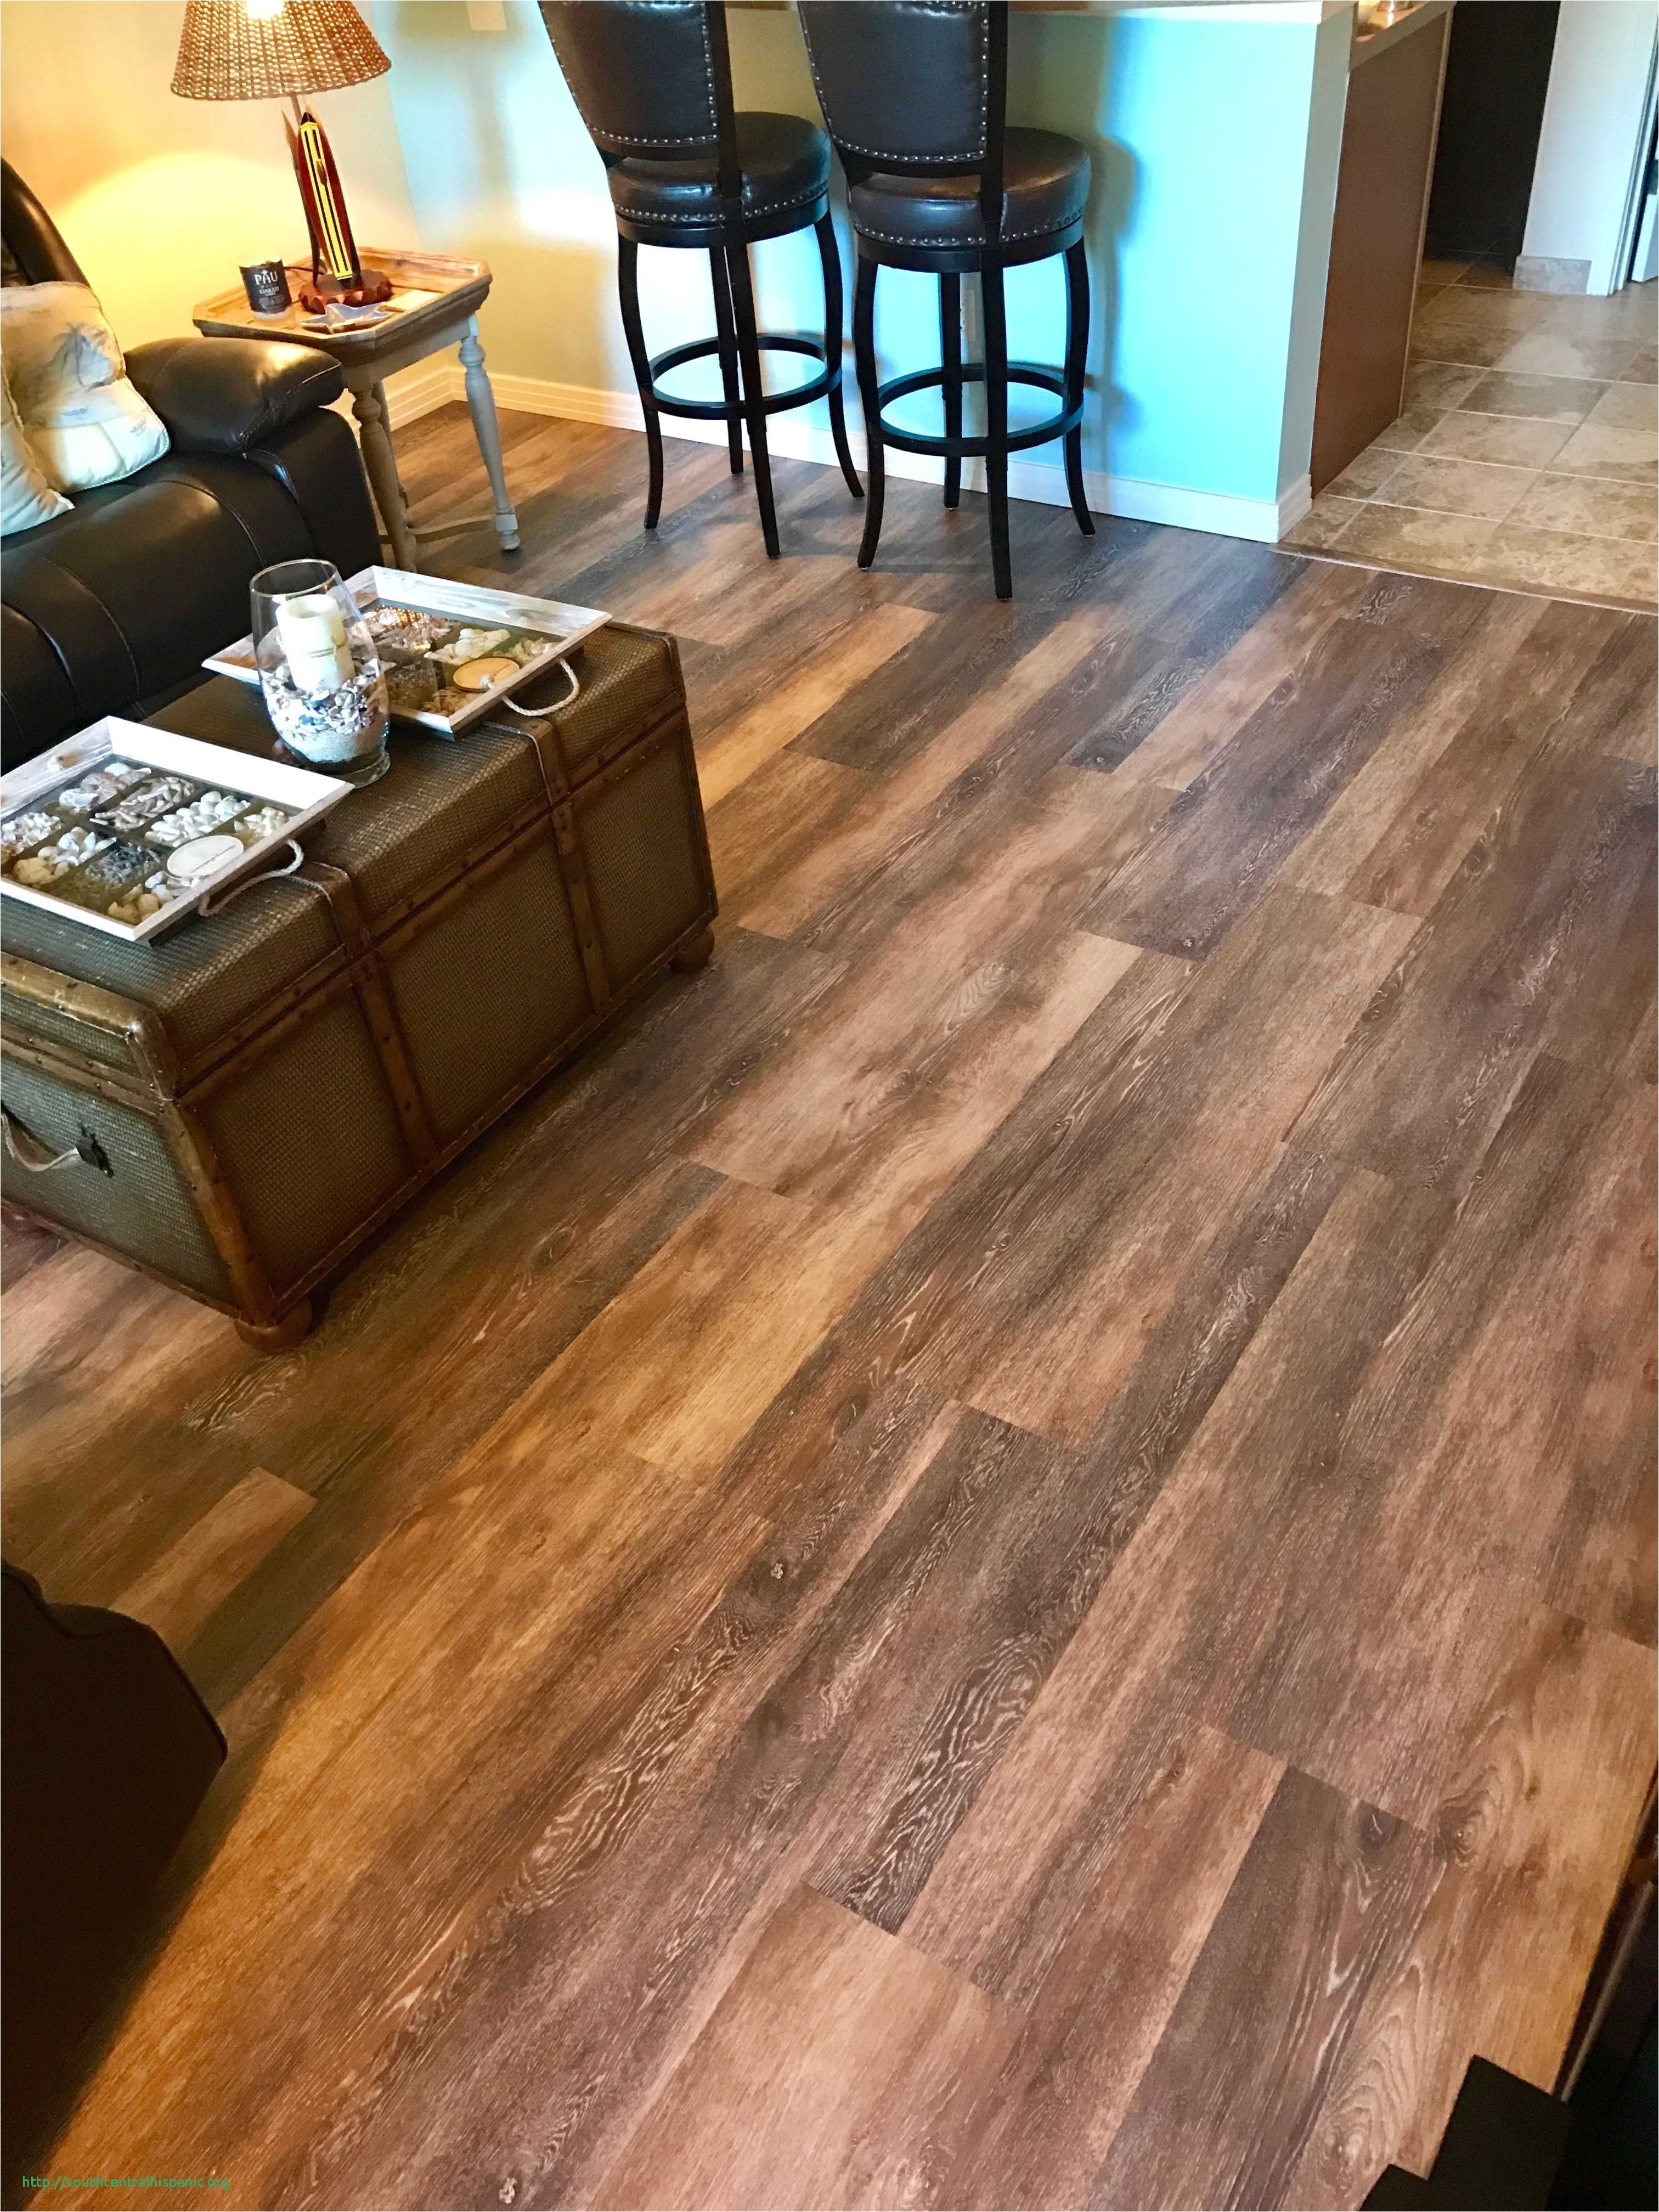 Laying Grip Strip Flooring Grip Strip Resilient Tile Flooring Frais